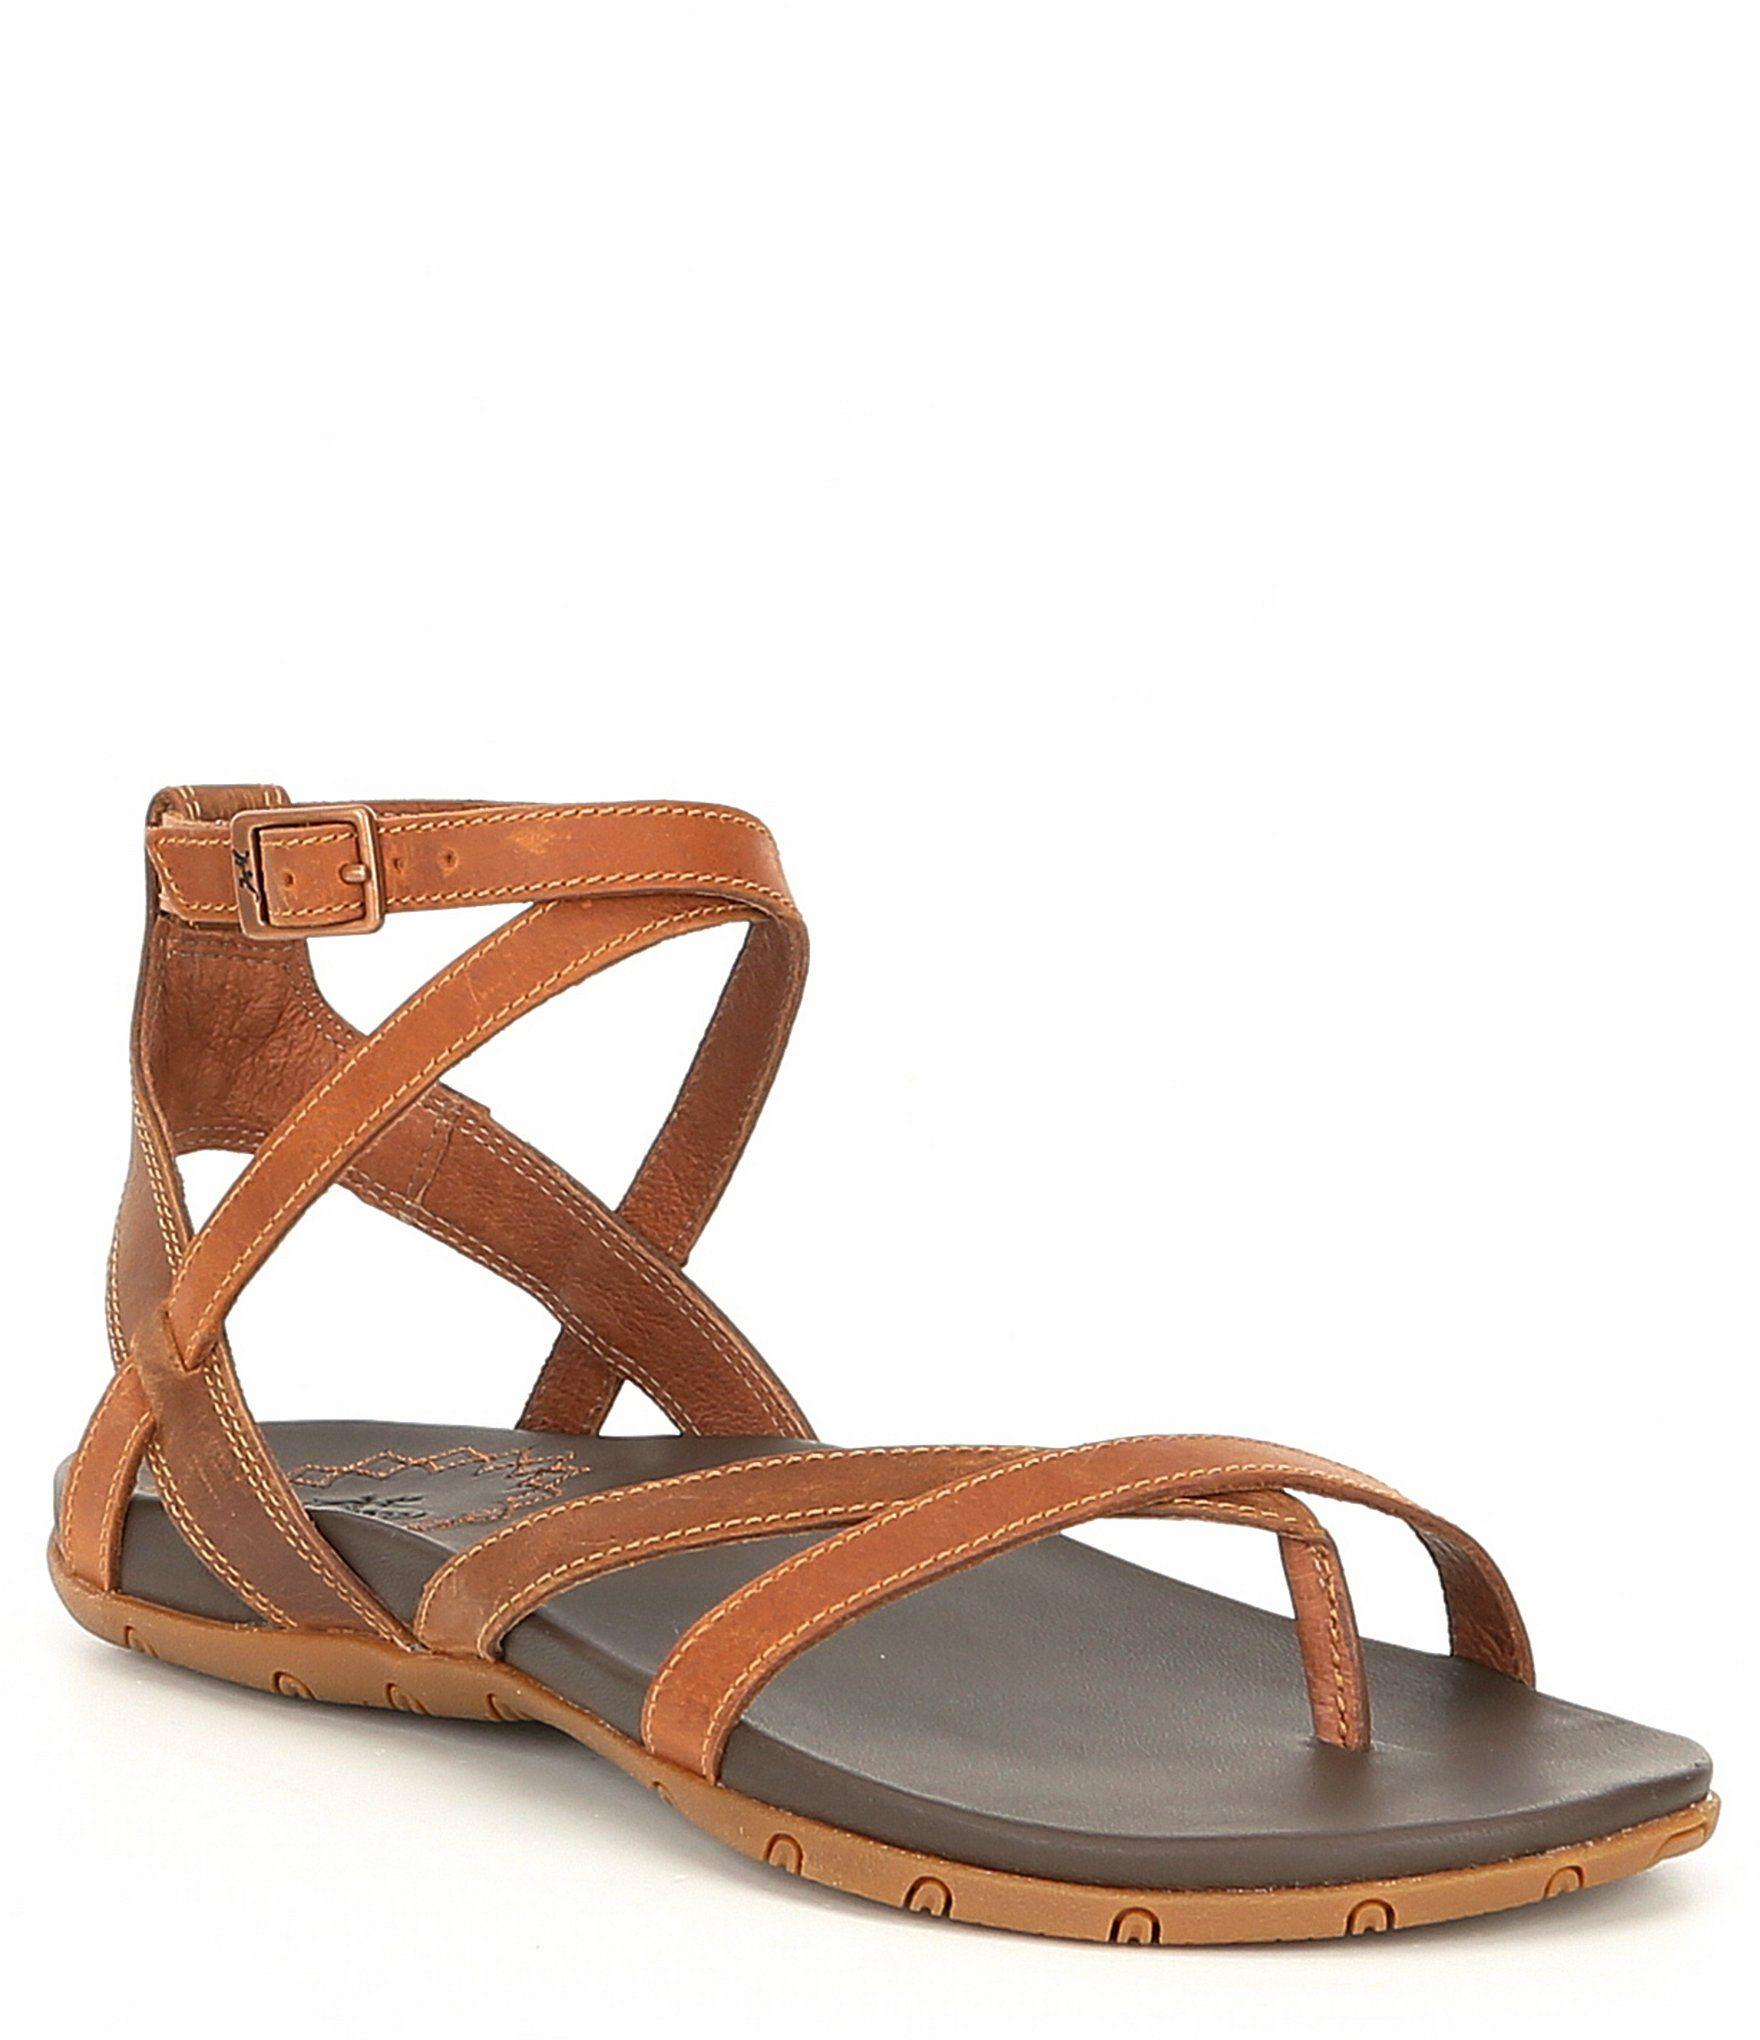 3bcd468c1fd Chaco Juniper Leather Sandals  Dillards